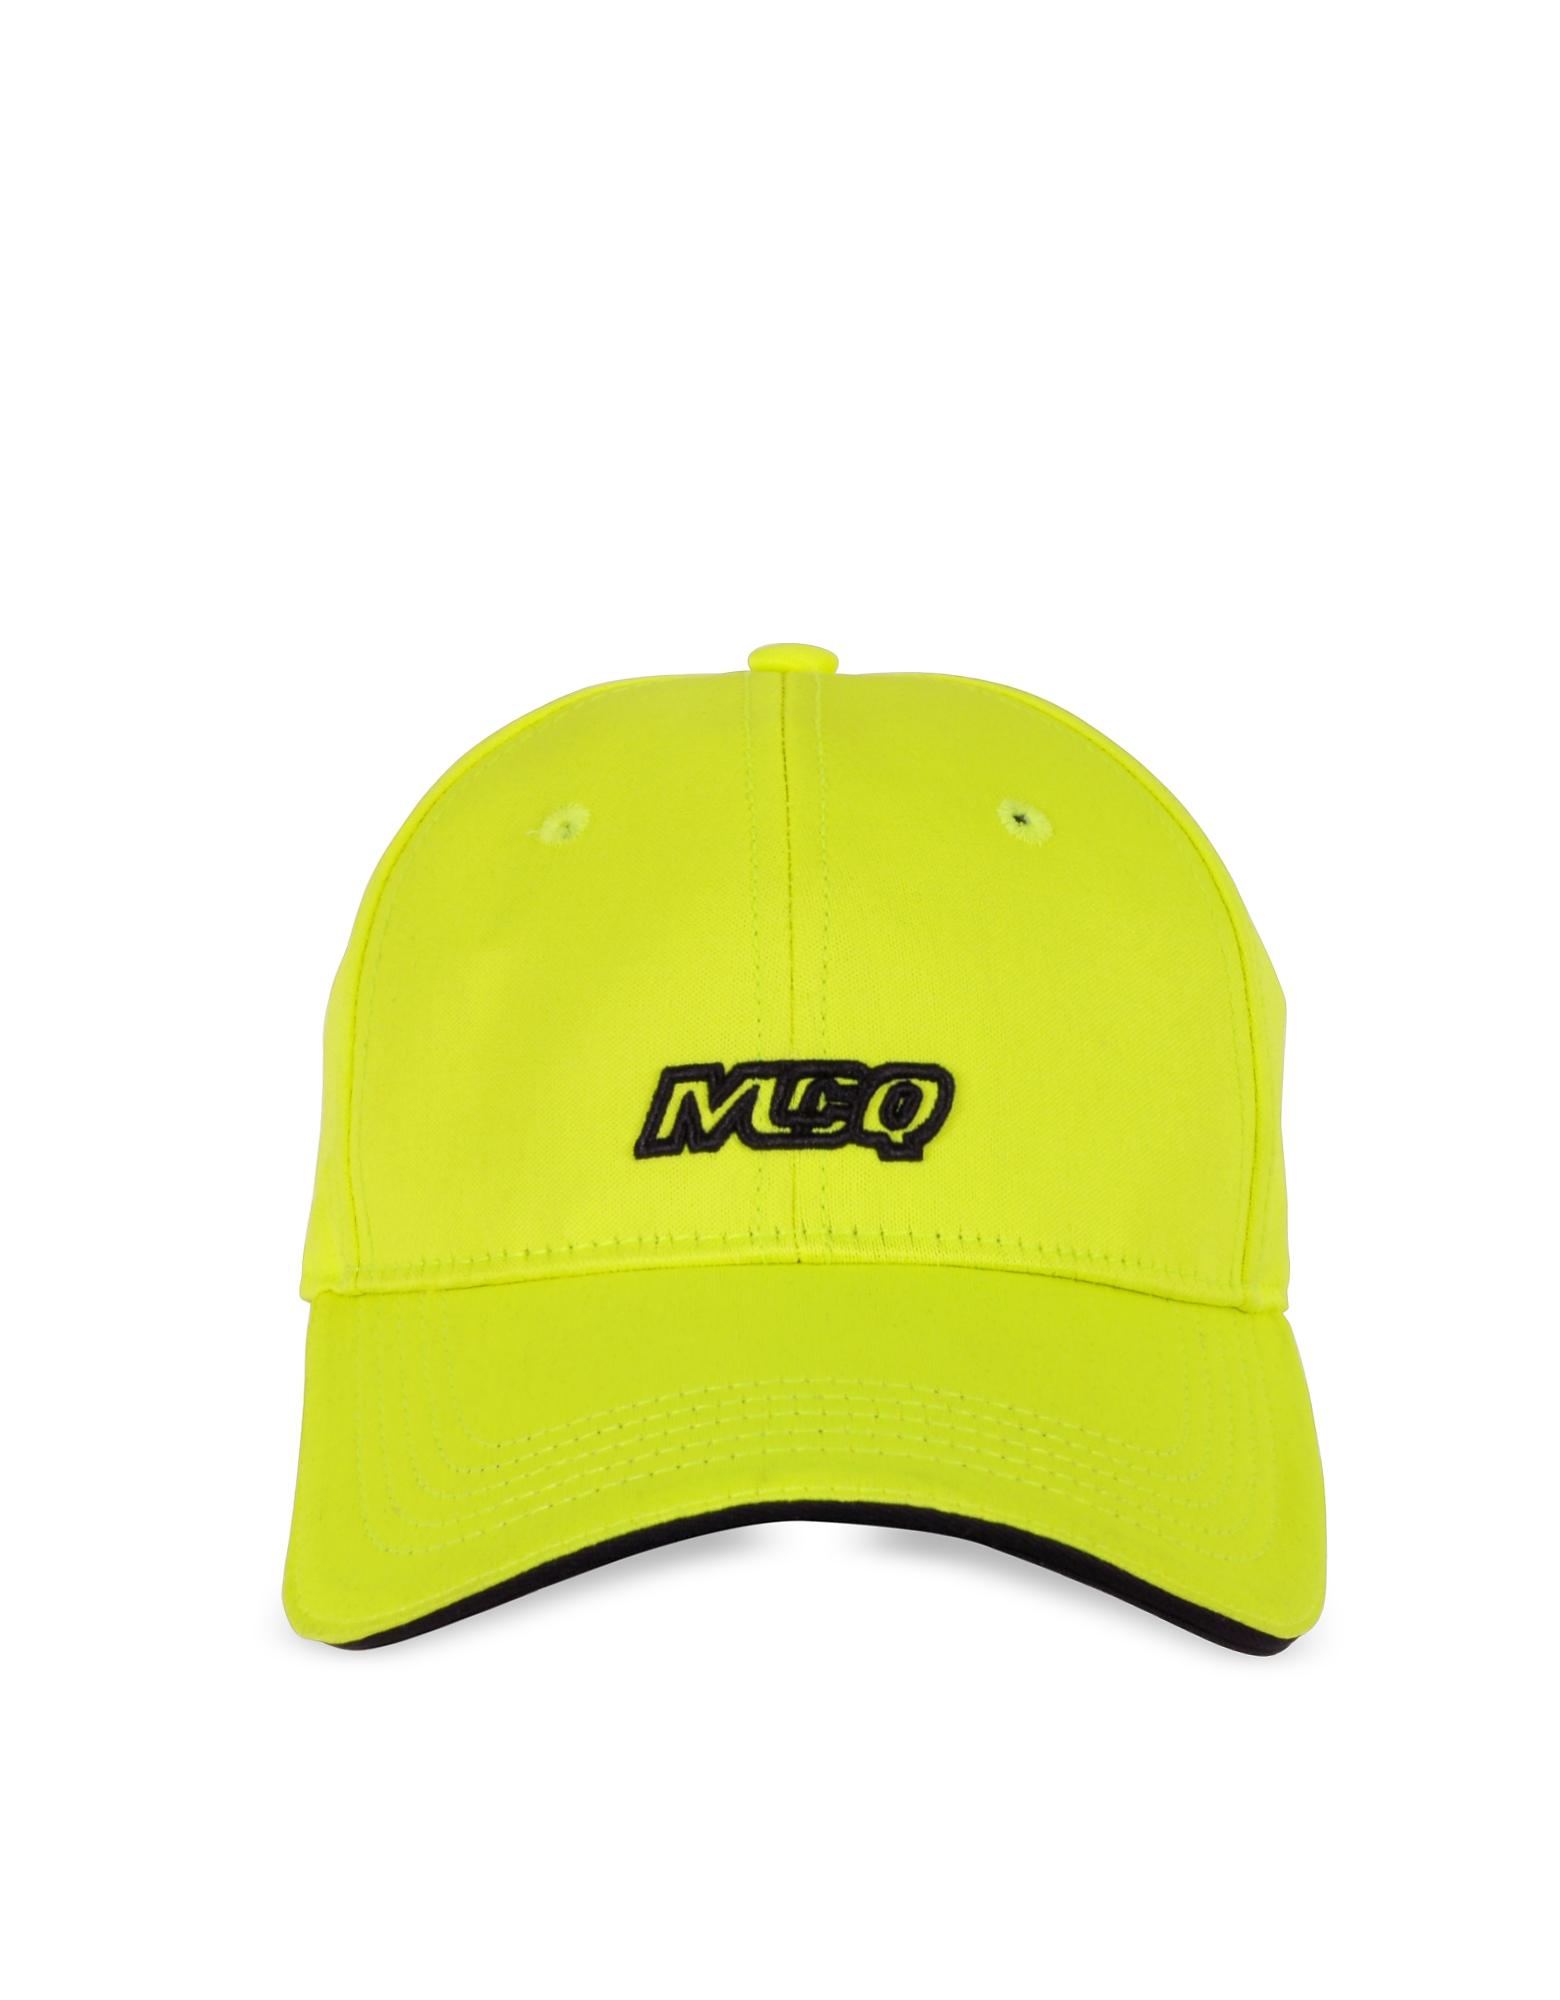 Neon Yellow Jersey Men's Basaball Cap